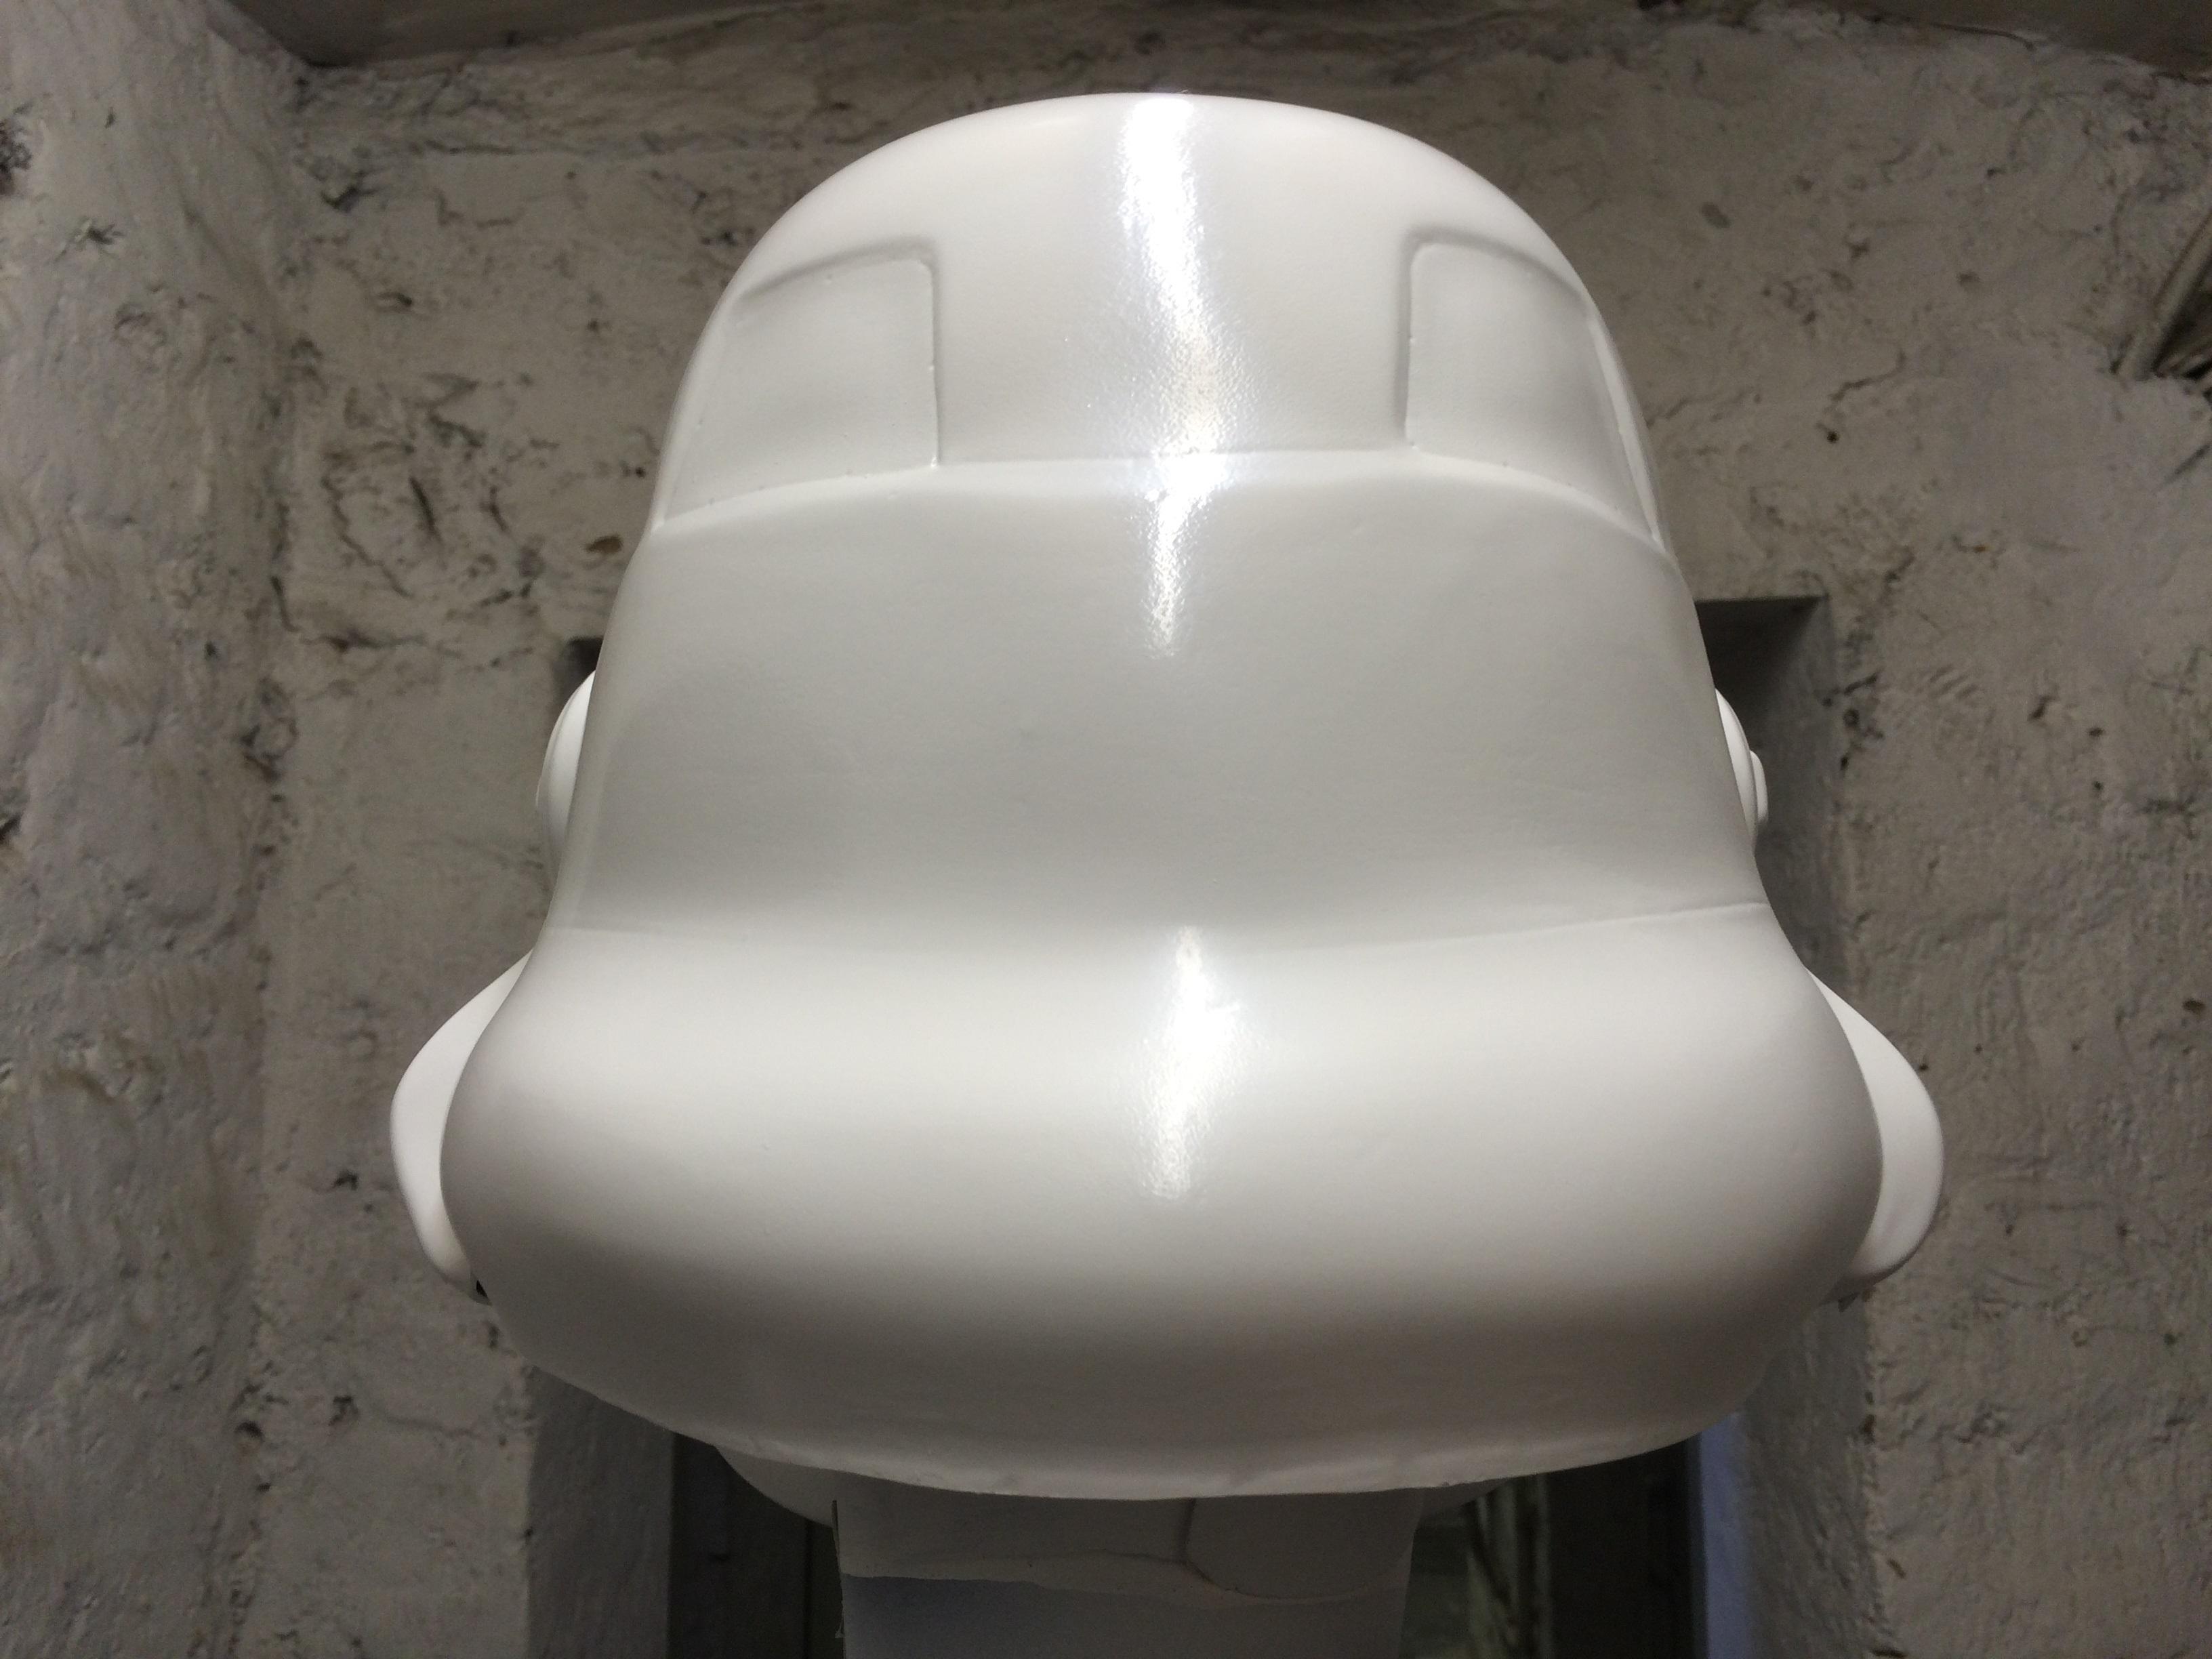 www.bartmarke.net/501st/WIP/FISD/Helmet/HDPE/13072015/PaintedBack2.JPG